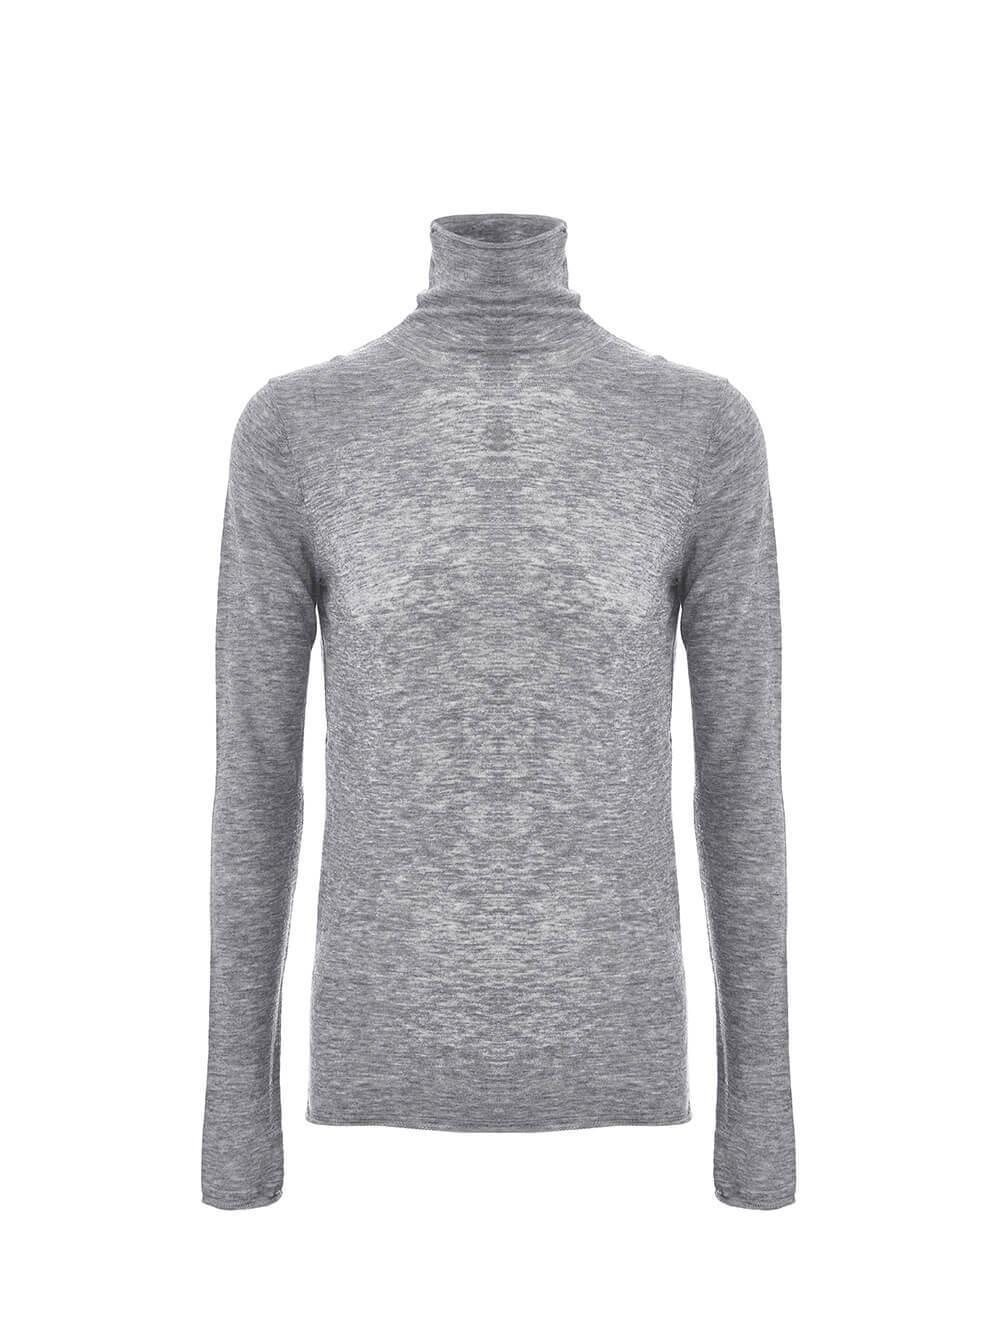 Женский свитер серый меланж цвета из 100% шерсти - фото 1